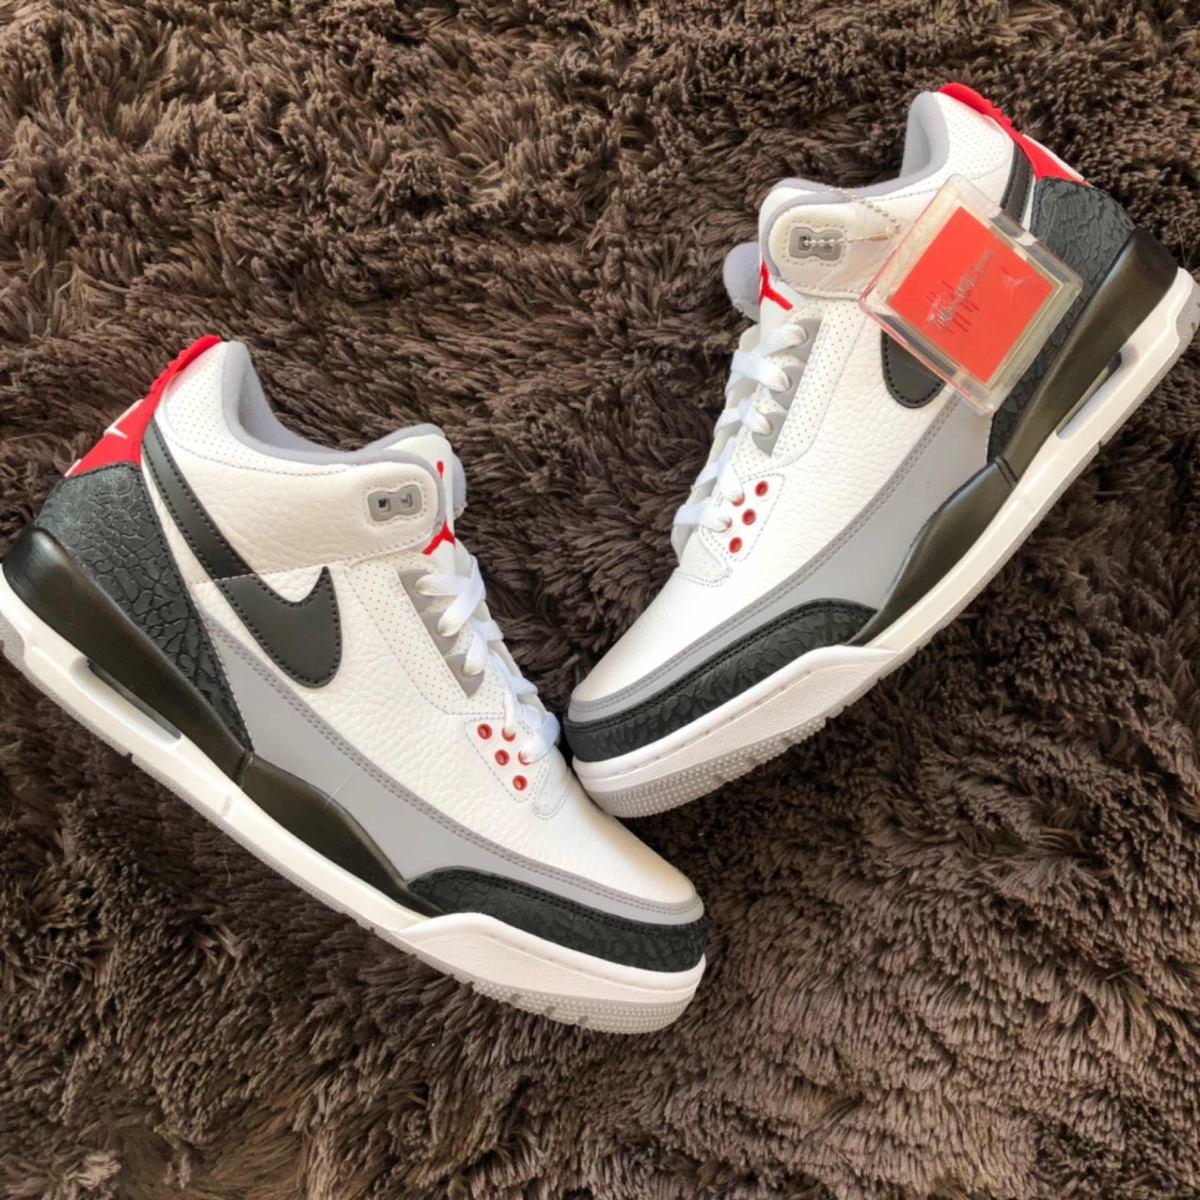 Nike Air Jordan 3 Tinker Hatfield R 1 450 00 Em Mercado Livre